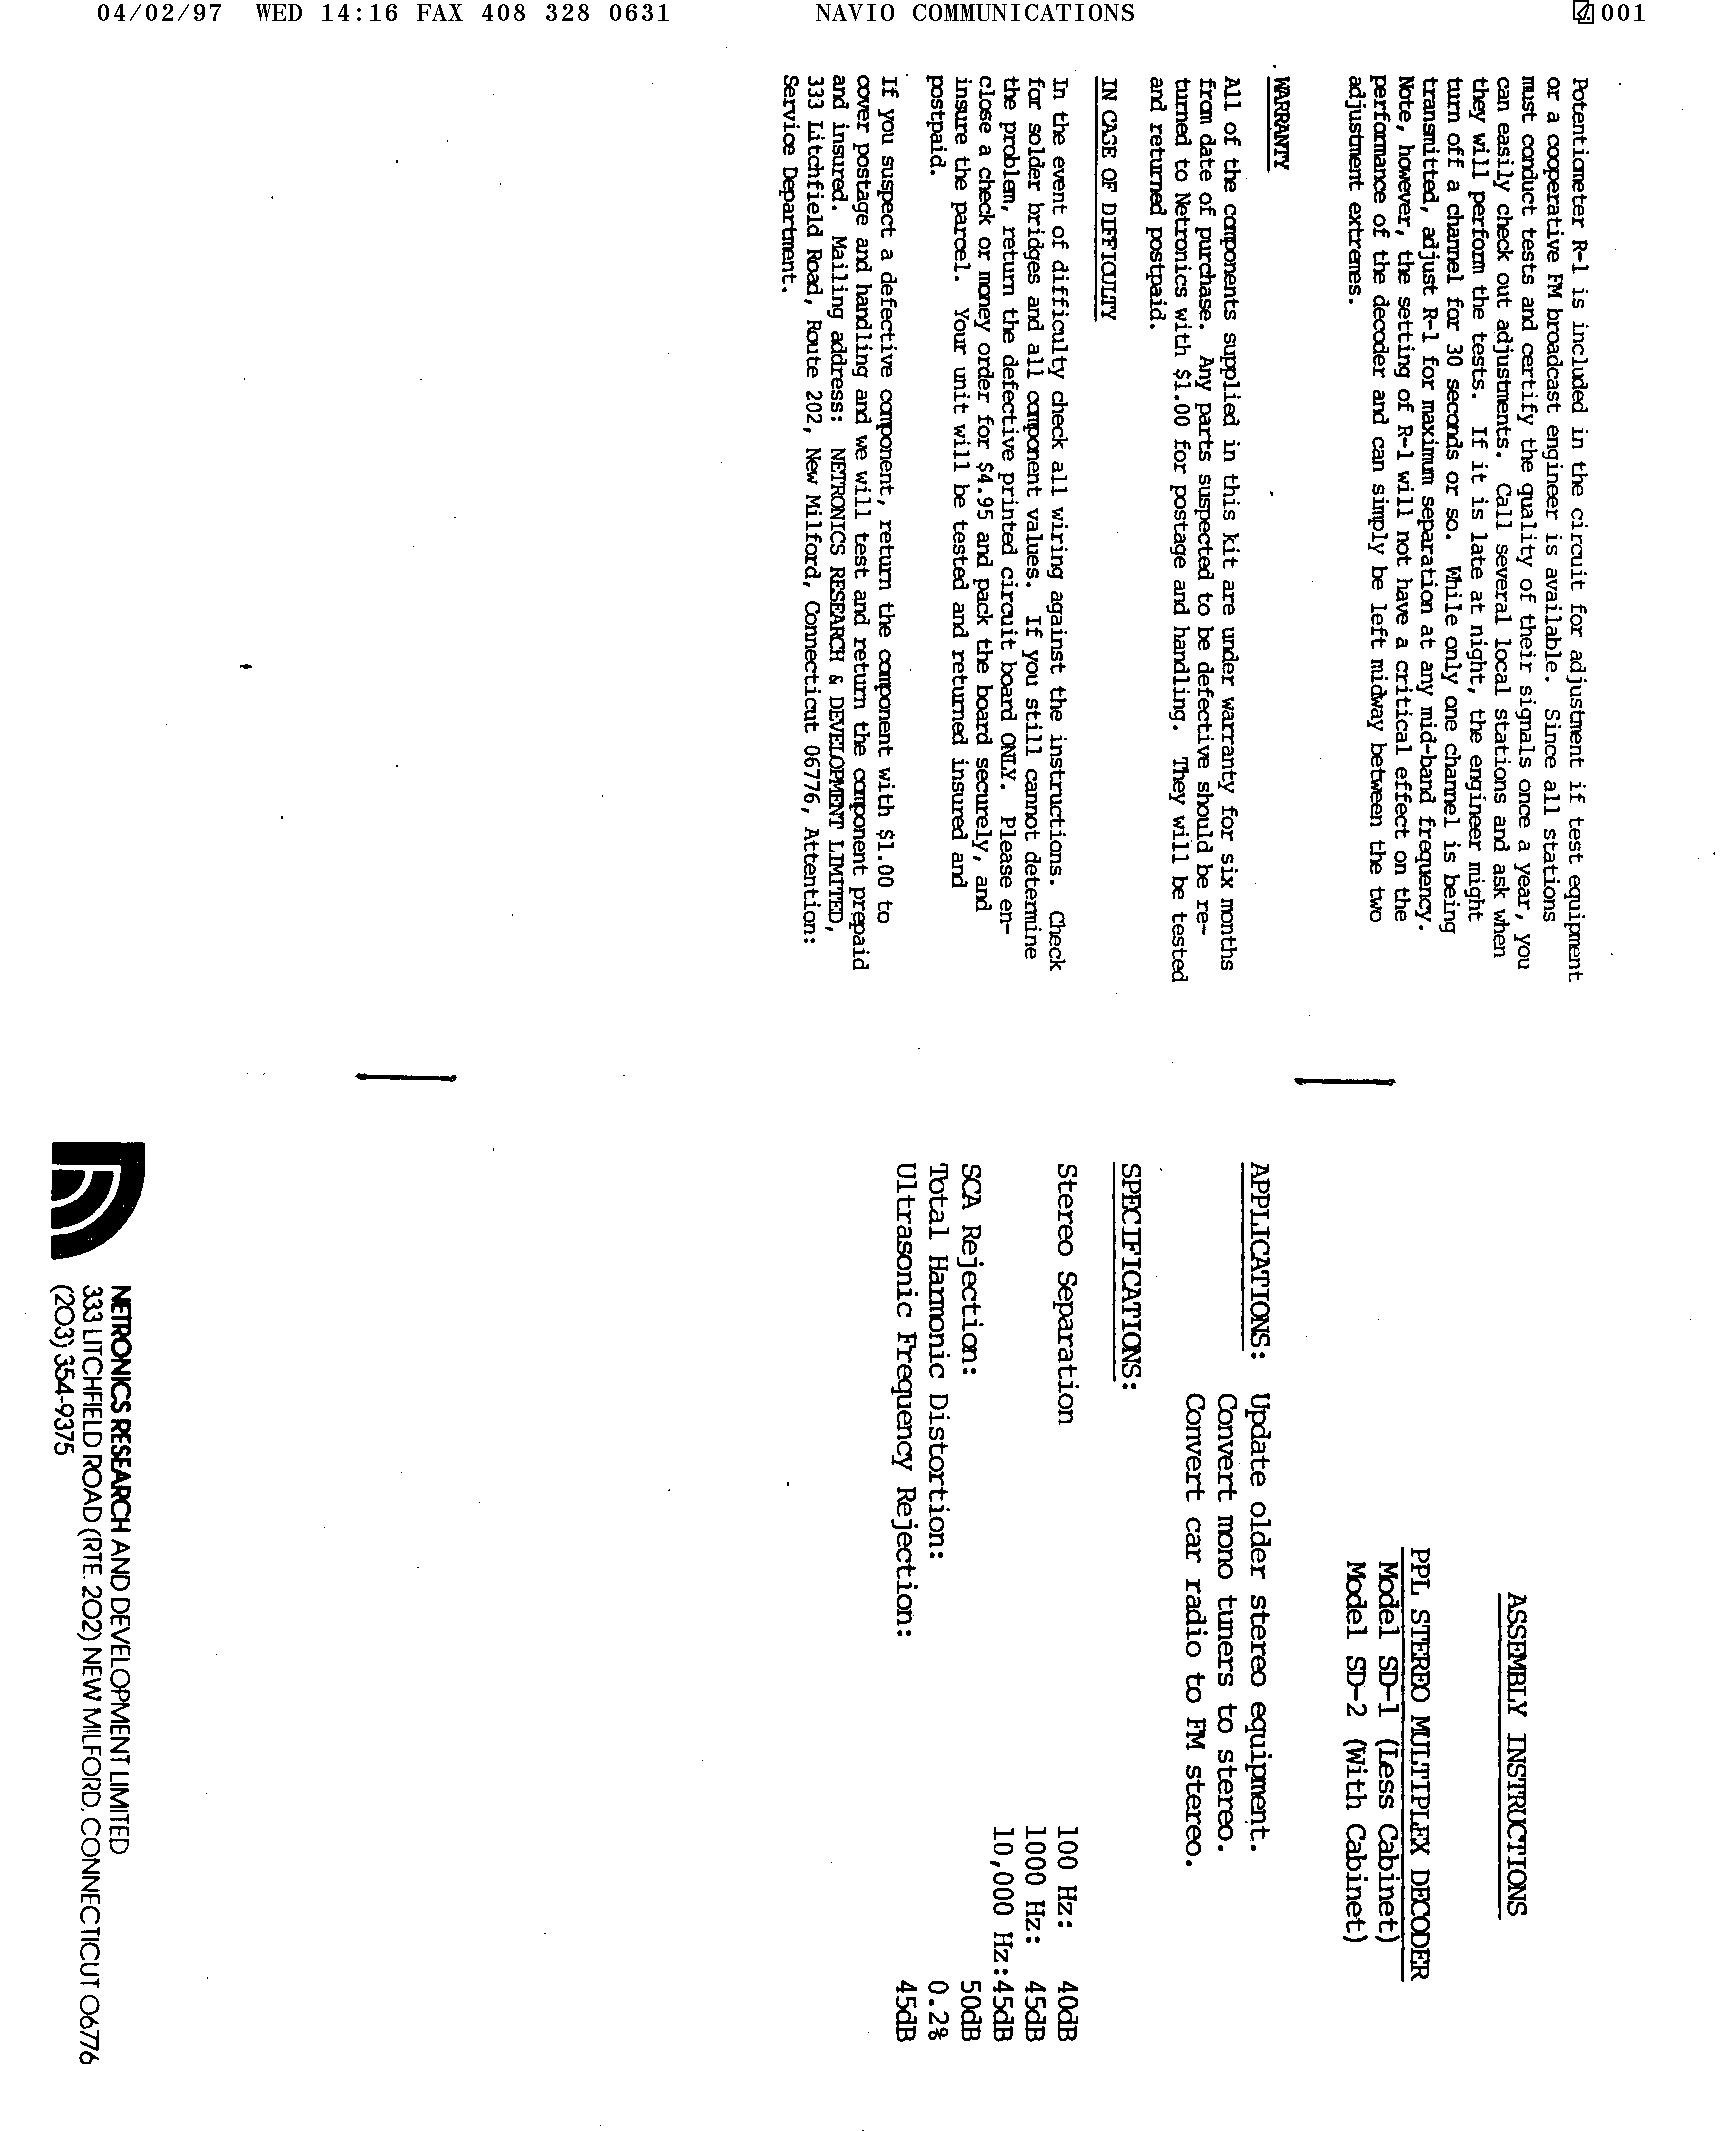 Index Of Dplatt Fm 5 Printed Circuit Board Kit 01